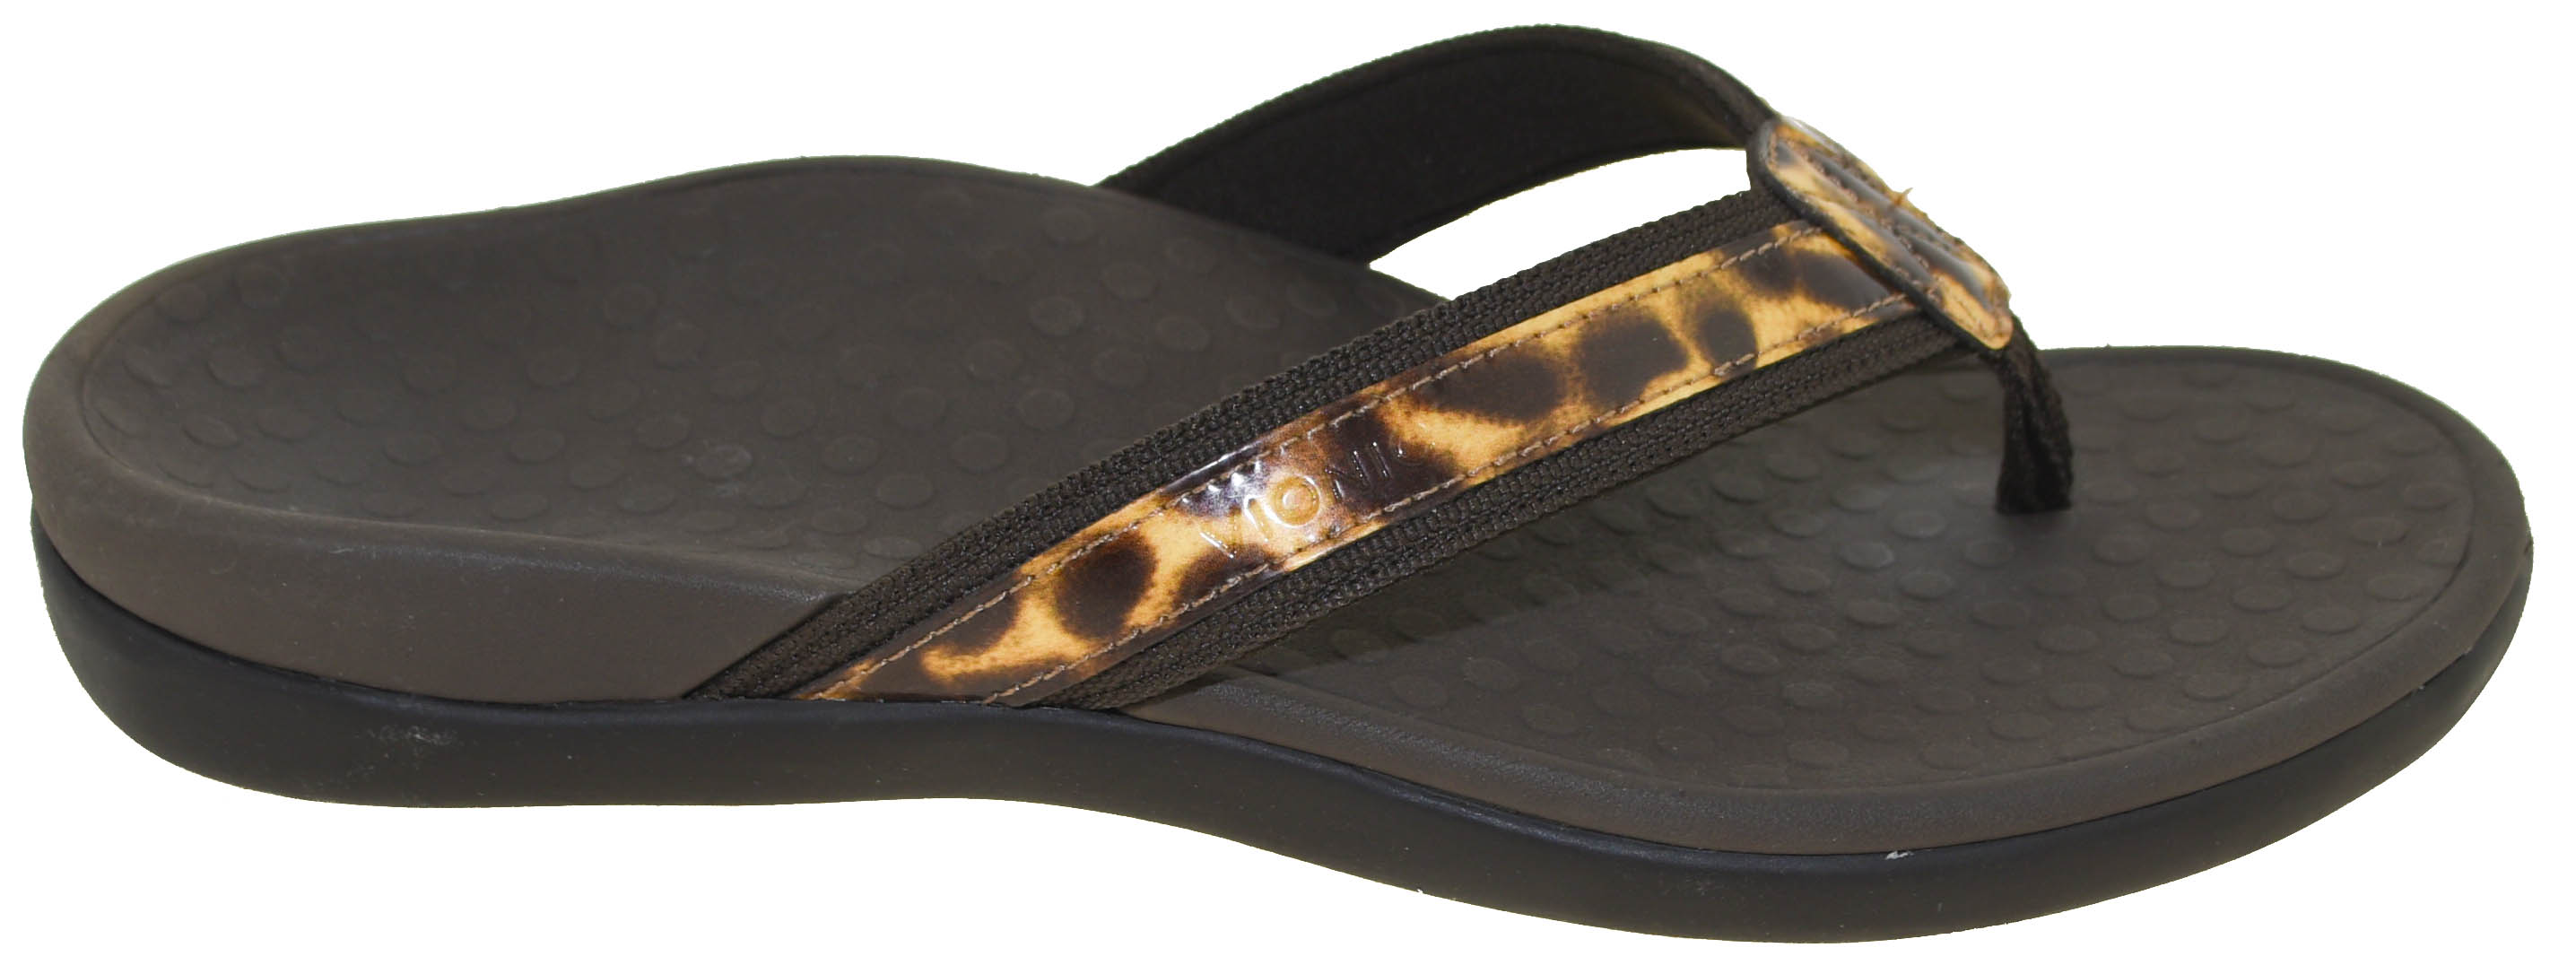 e0d72fb148 Vionic Women's Tide II Thong Sandal Brown Leopard | eBay